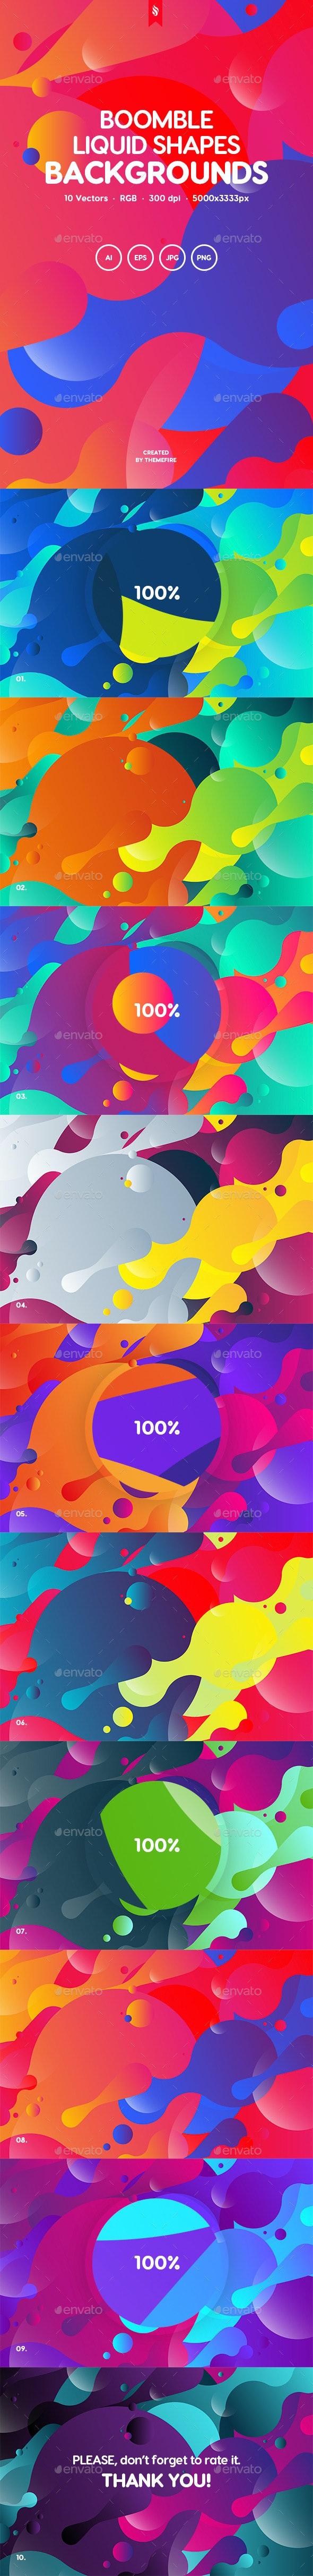 Boomble - Colorful Liquid Shapes Backgrounds - Backgrounds Graphics